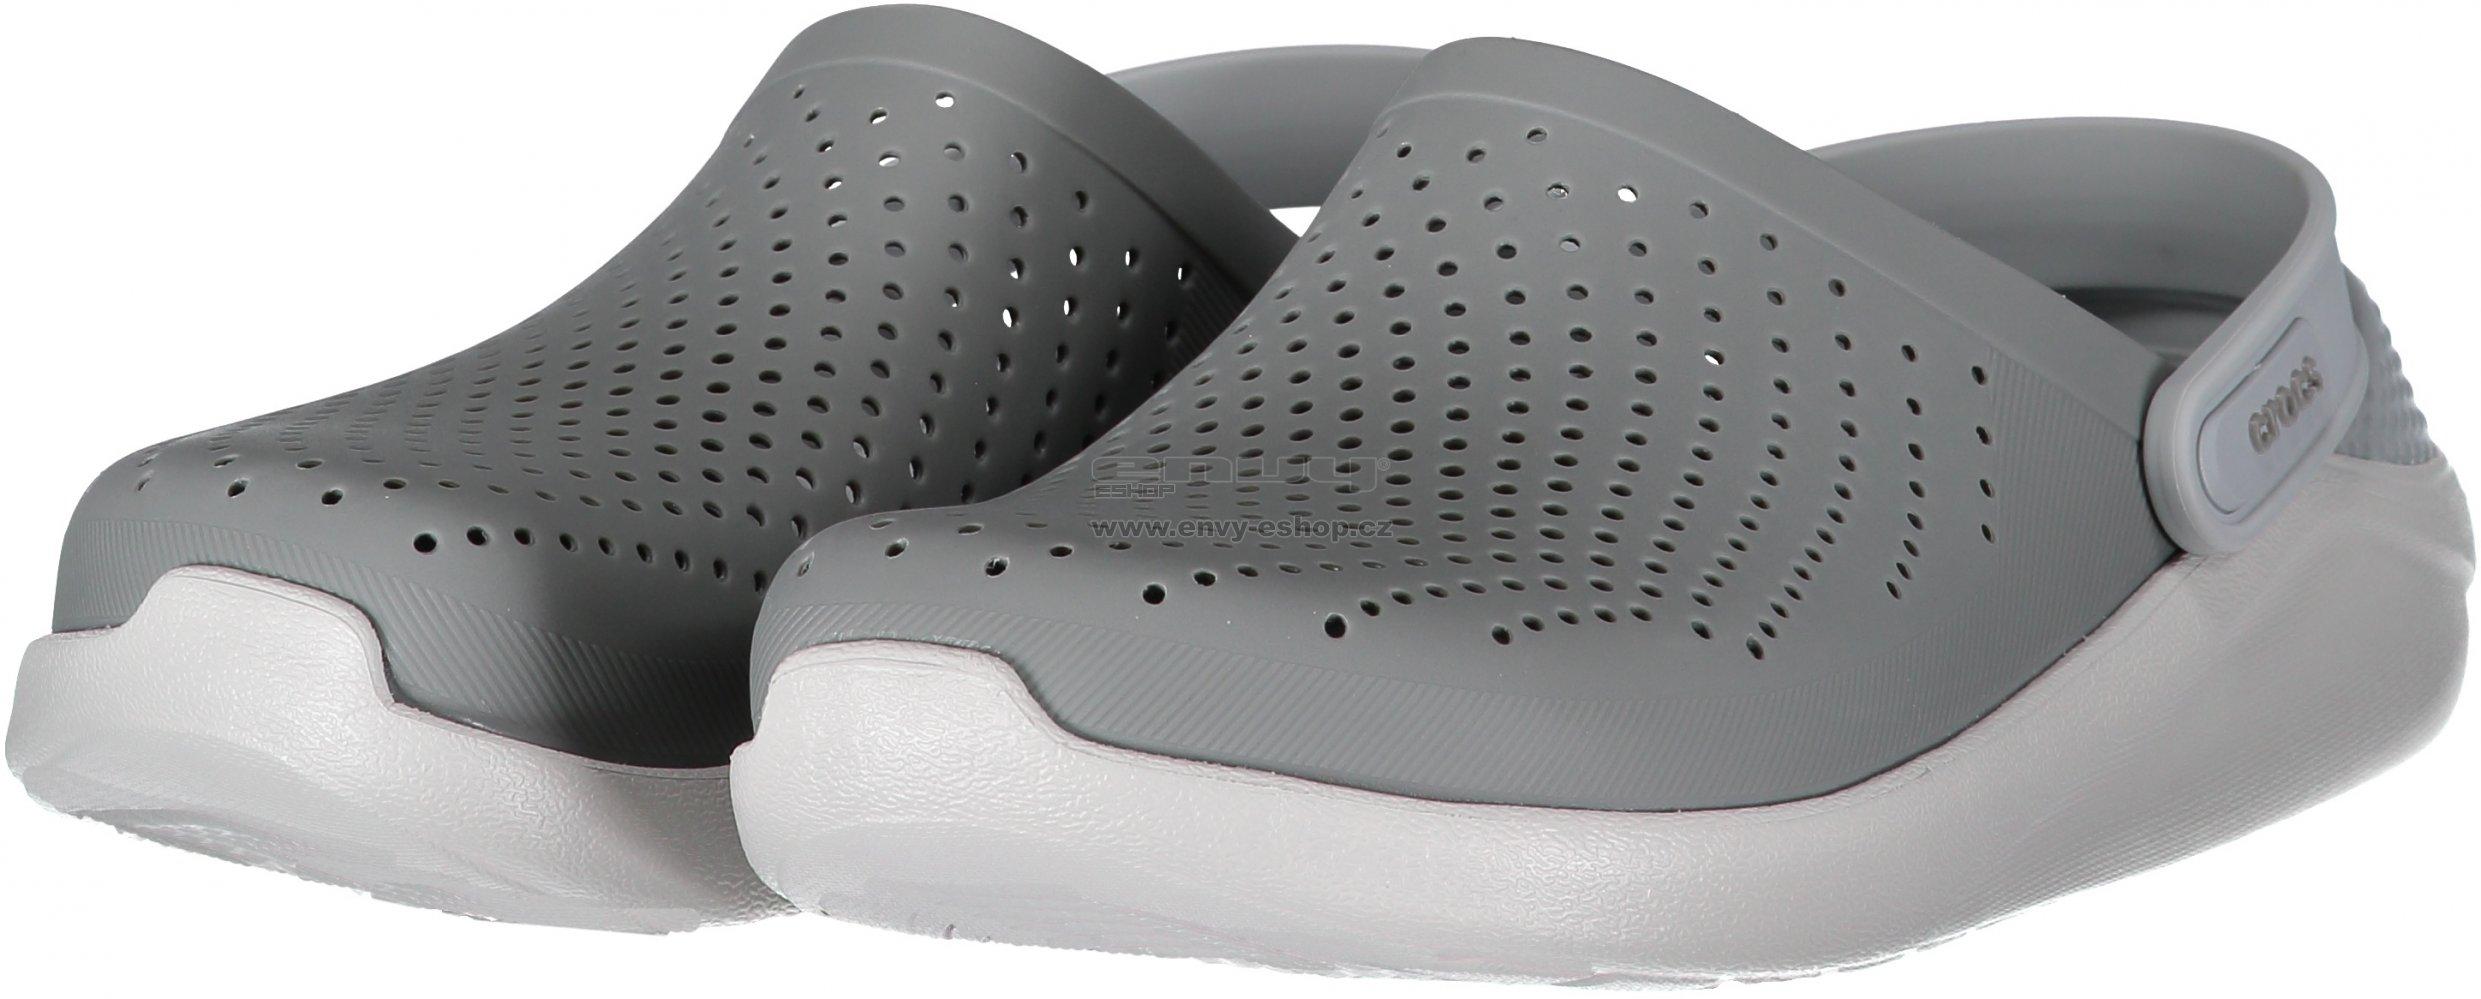 fb8453000376 Pánské pantofle CROCS LITERIDE CLOG 204592-06J SMOKE PEARL WHITE ...